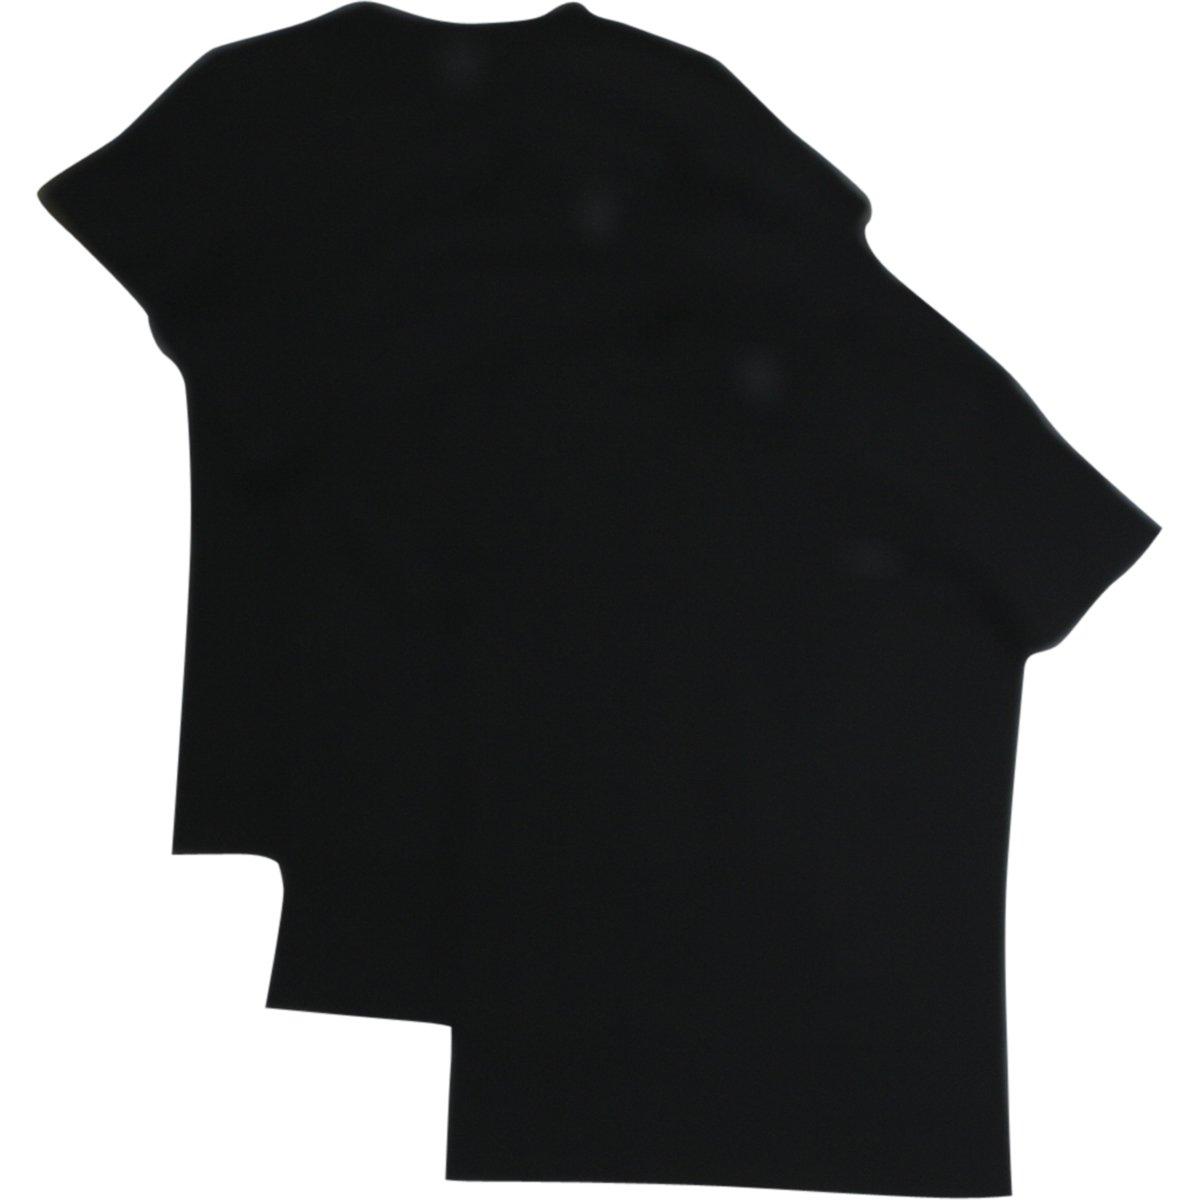 Diesel Men's Jake 3-Pack Essentials Crew Neck T-Shirt, Black, X-Large